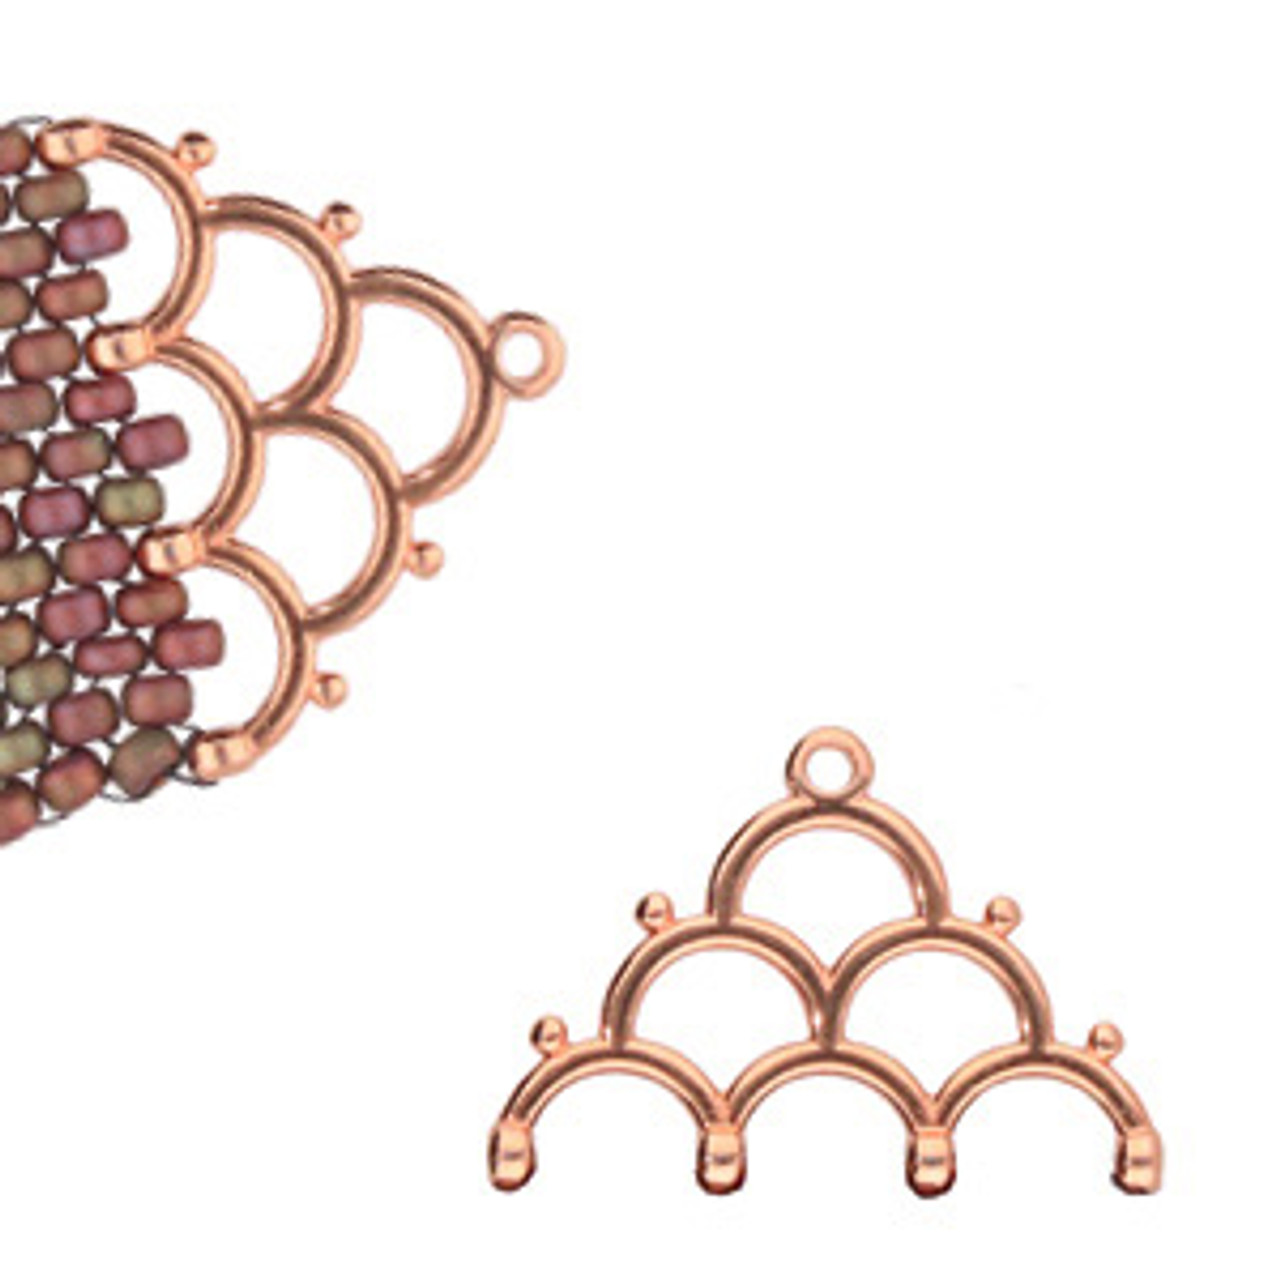 Lakos IV 8/0 Bead Ending Rose Gold Plated (2pk)